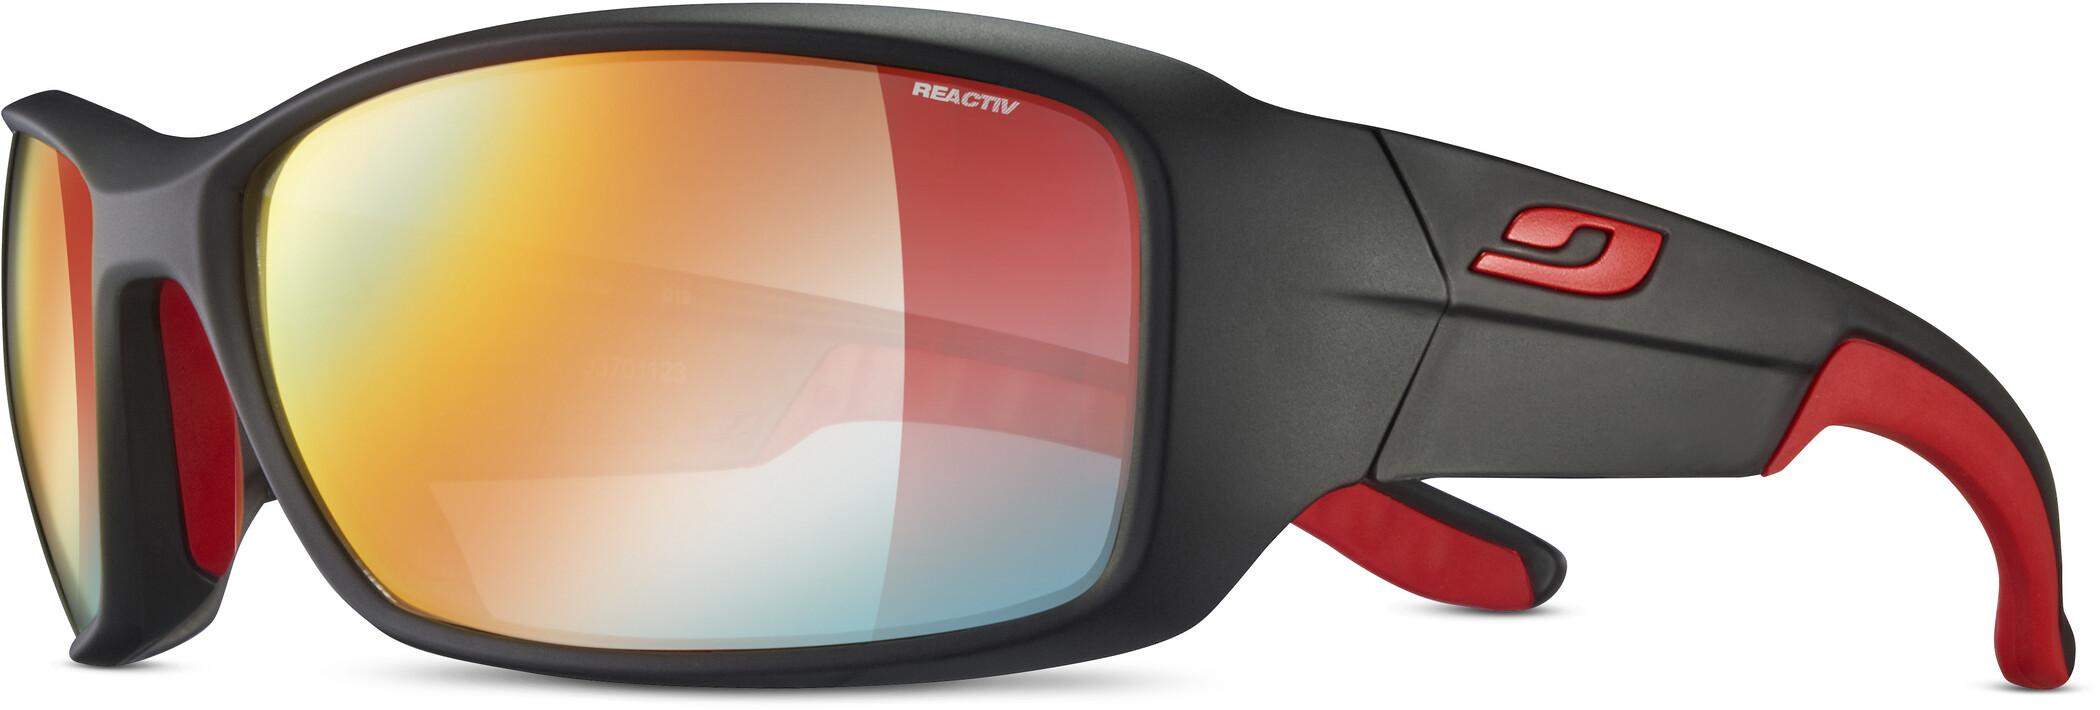 Julbo Run Reactiv Performance Solbriller Herrer, black/red/multilayer red (2020) | Glasses